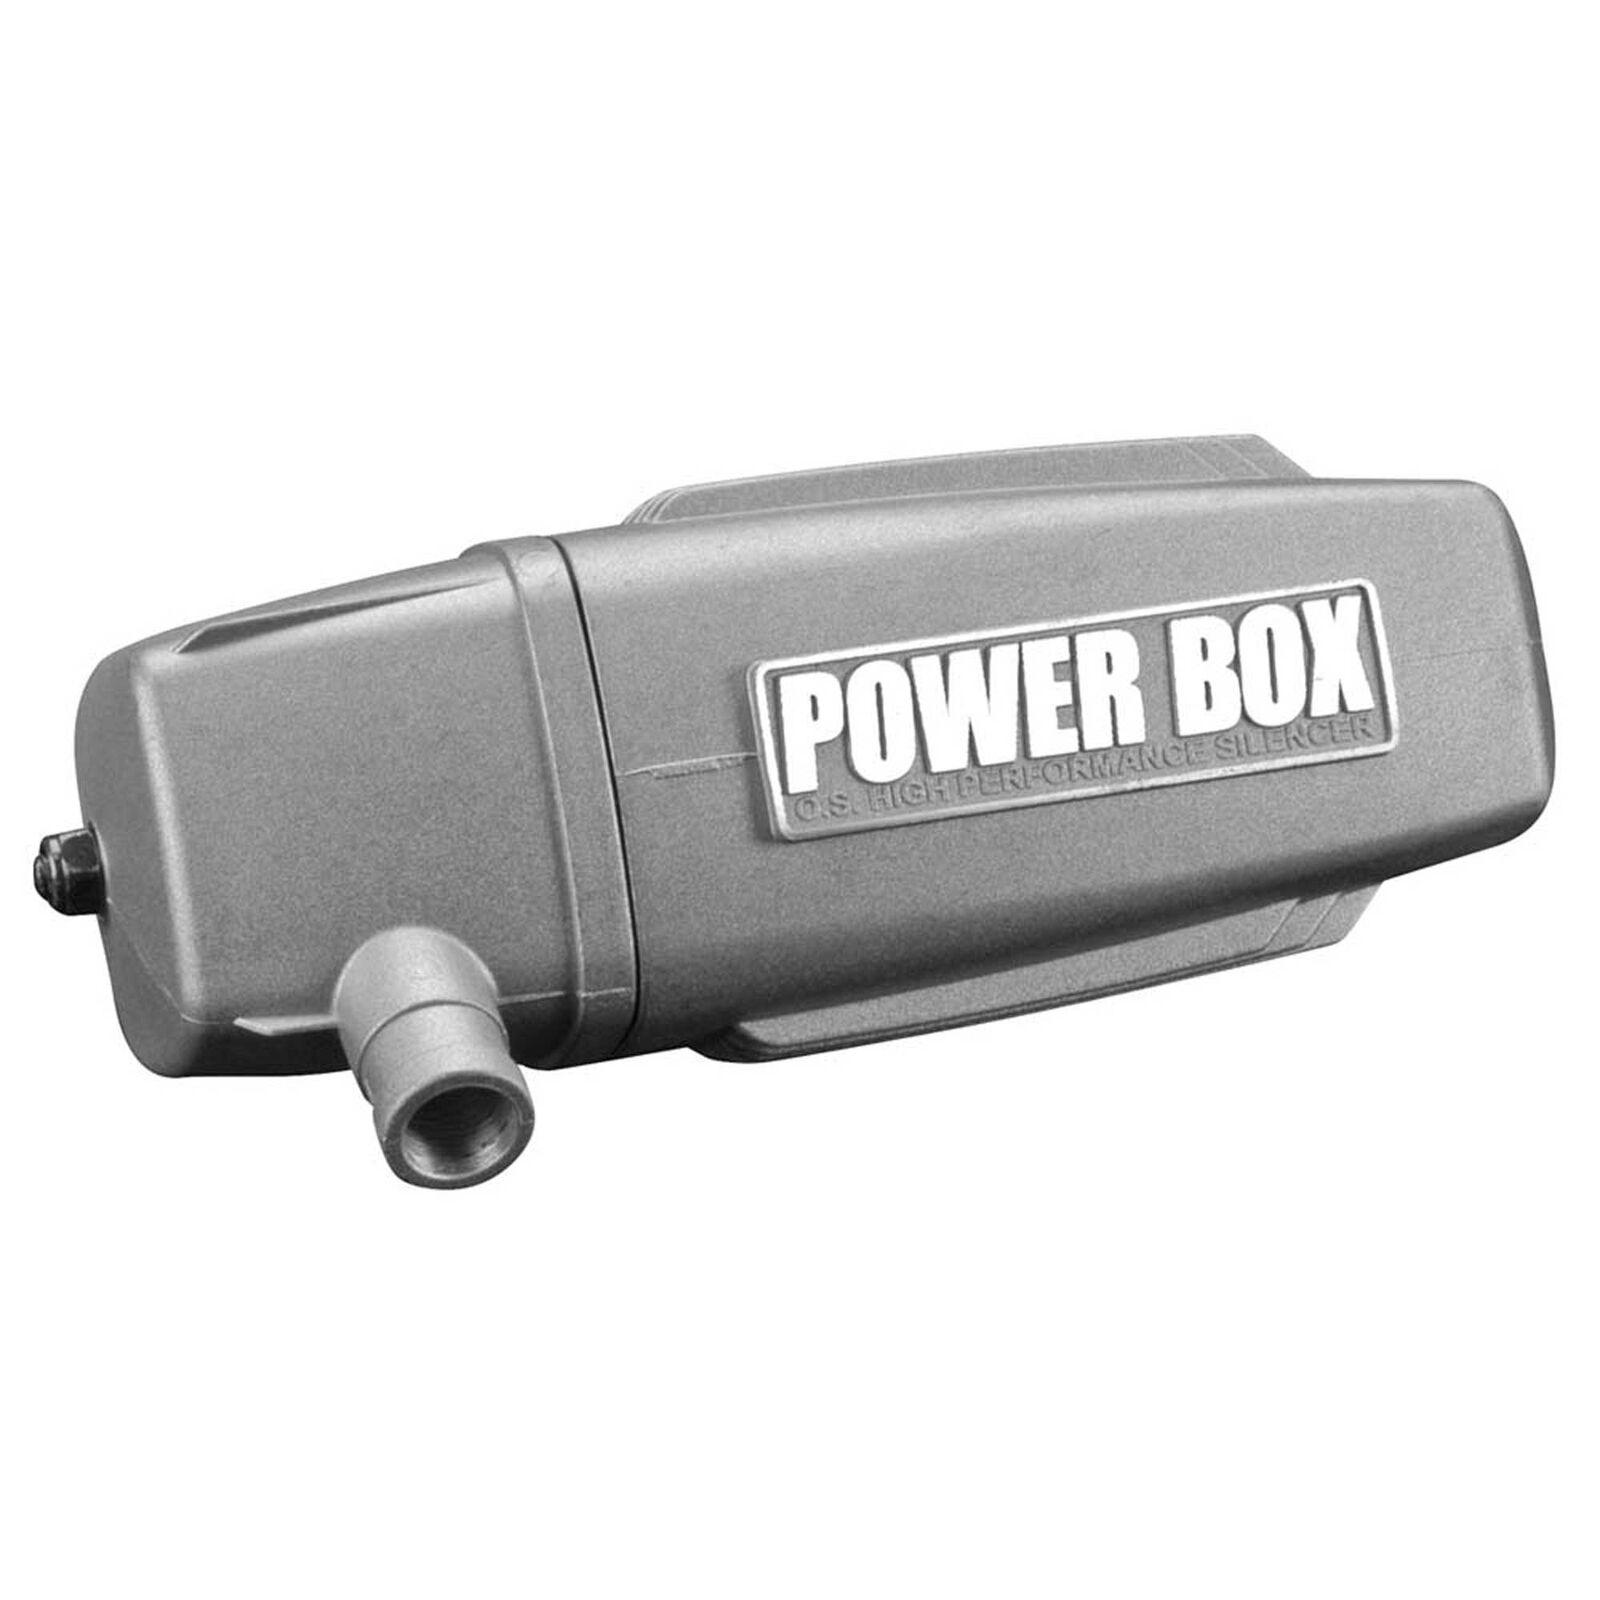 Muffler Power Box: 120AX